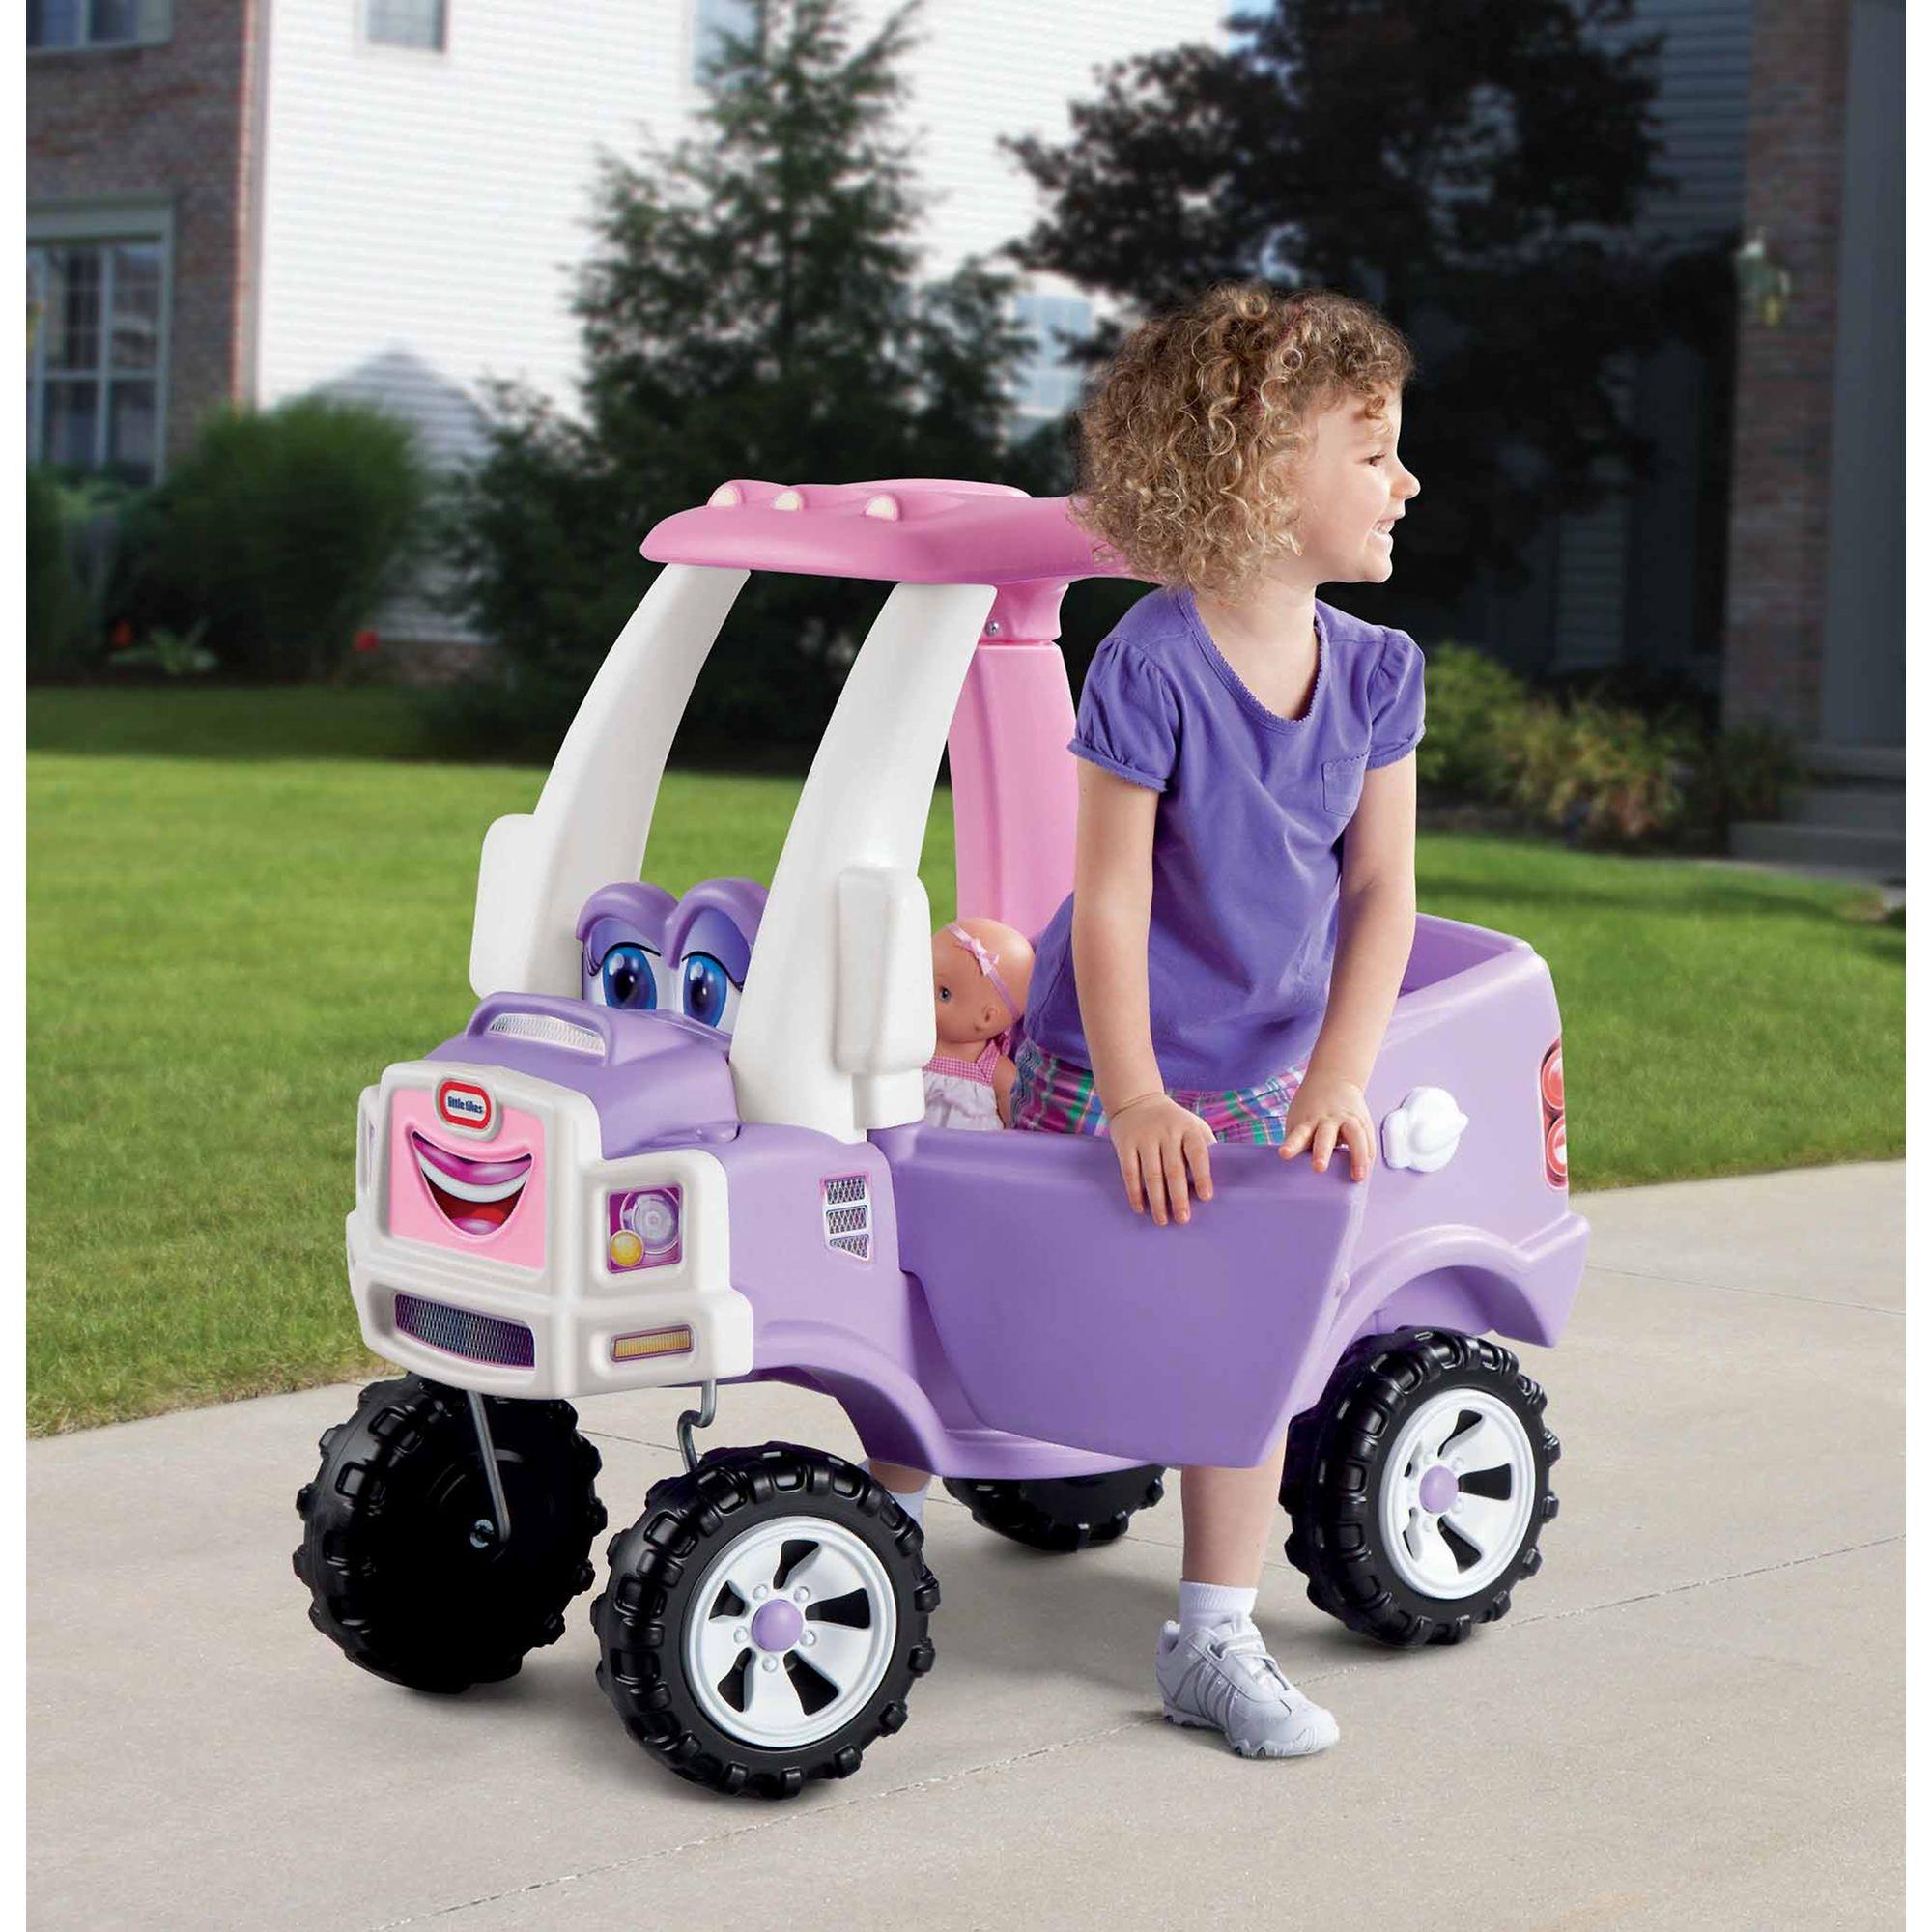 Little Tikes Princess Cozy Truck Little tikes, Cozy, Bjs